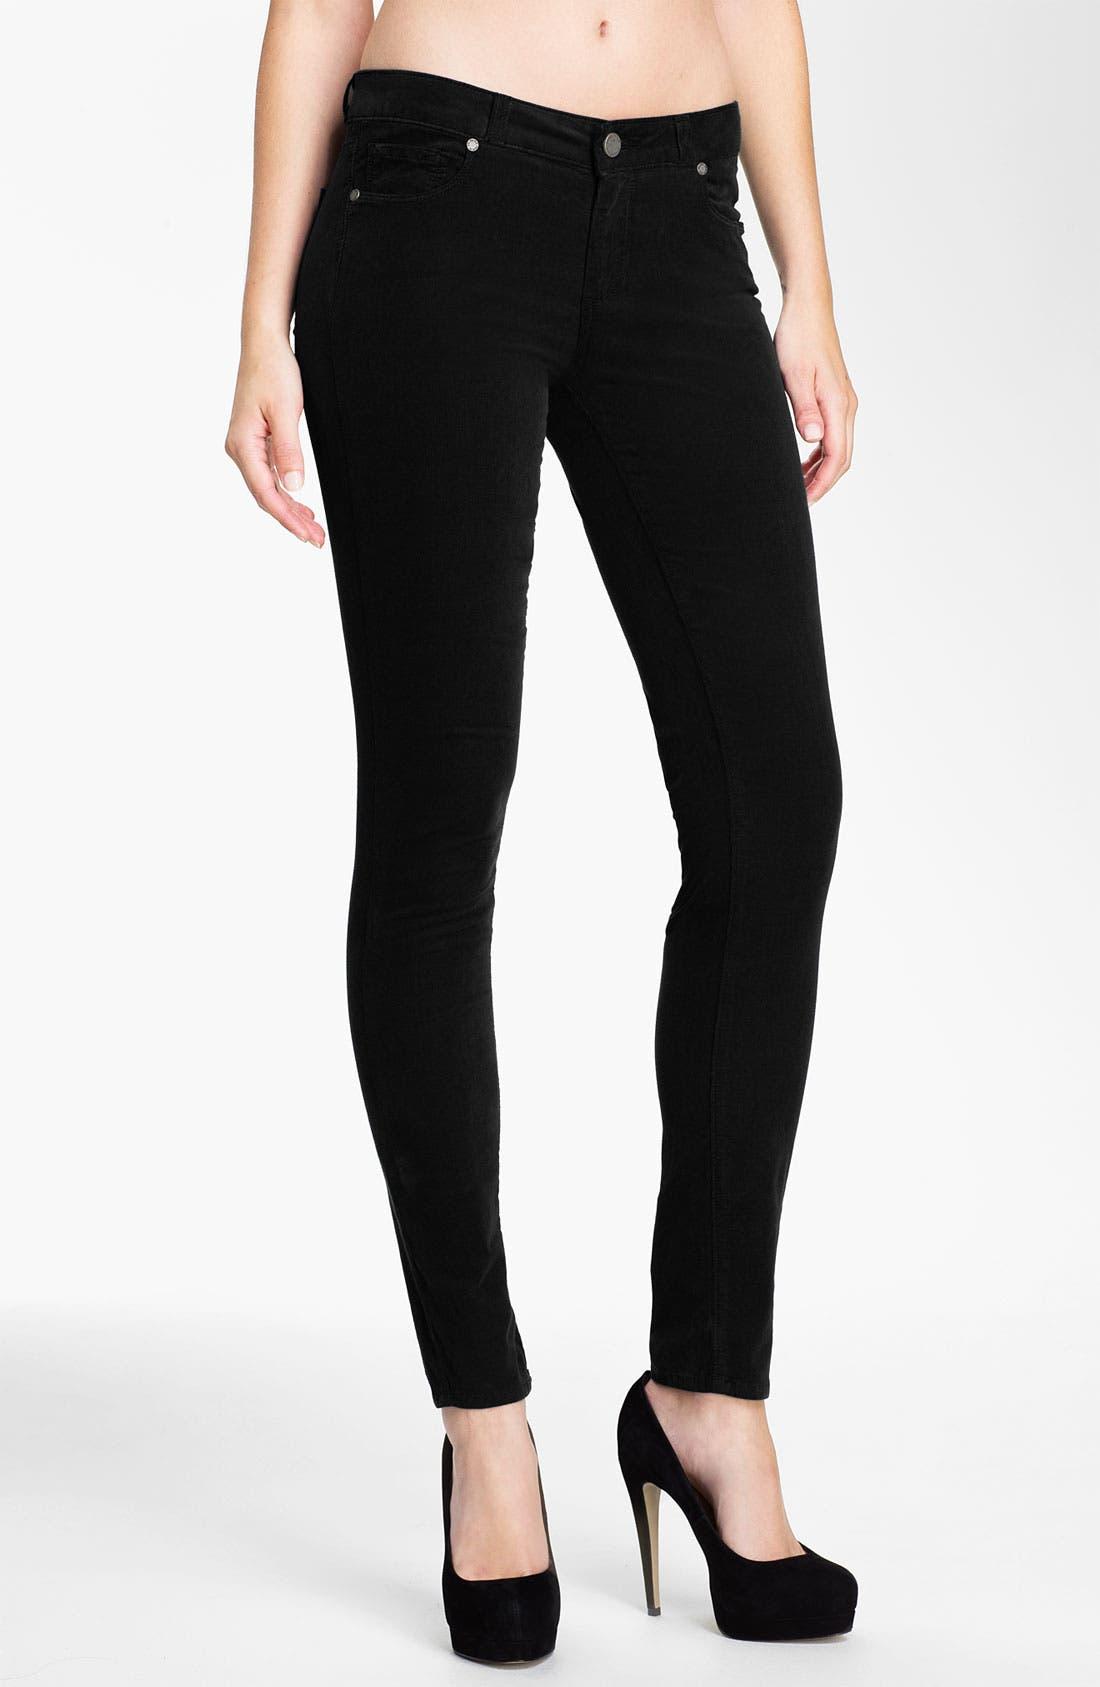 Alternate Image 1 Selected - Paige Denim 'Verdugo' Stretch Denim Skinny Jeans (Black)